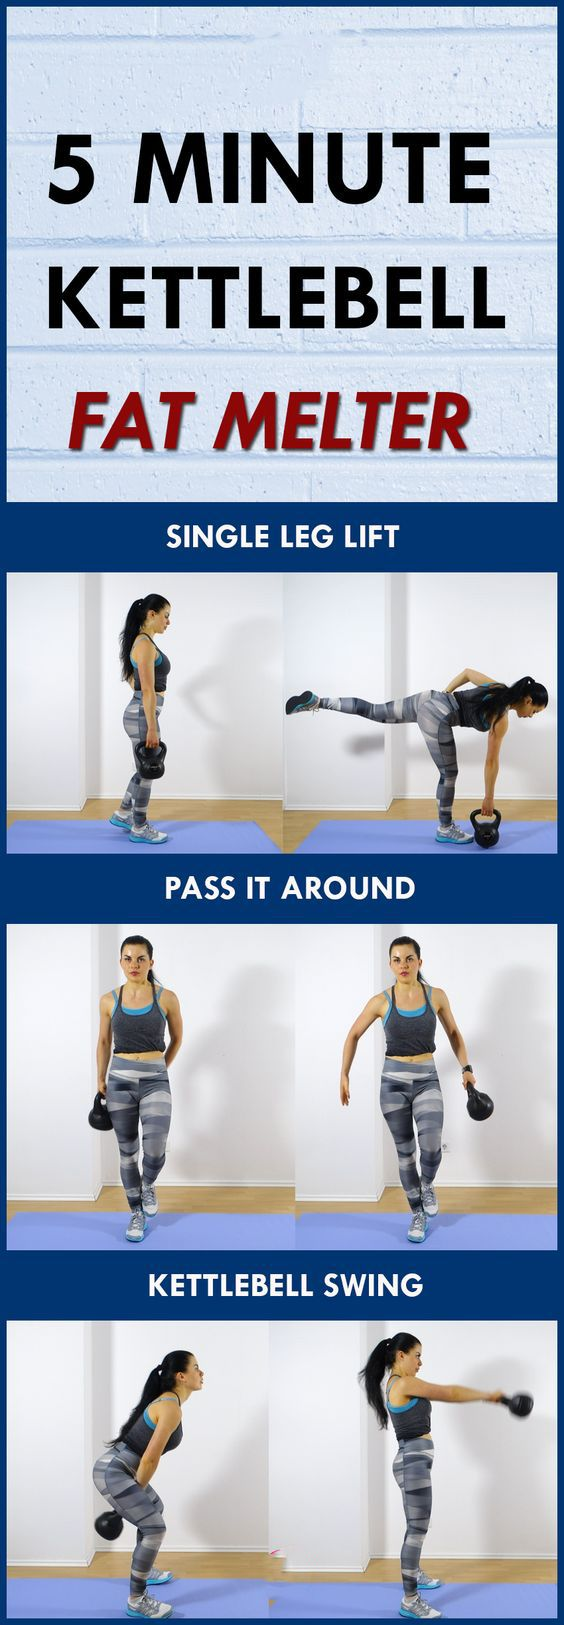 Best Kettlebell Exercises For Women (arms, glutes, back) - This kettlebell workout will burn fat fast and build lean muscle. #weightlossworkout #kettlebellworkout #workoutforwomen #burnfat https://www.youtube.com/watch?v=Q96gA6-kRZk https://www.kettlebellmaniac.com/kettlebell-exercises/